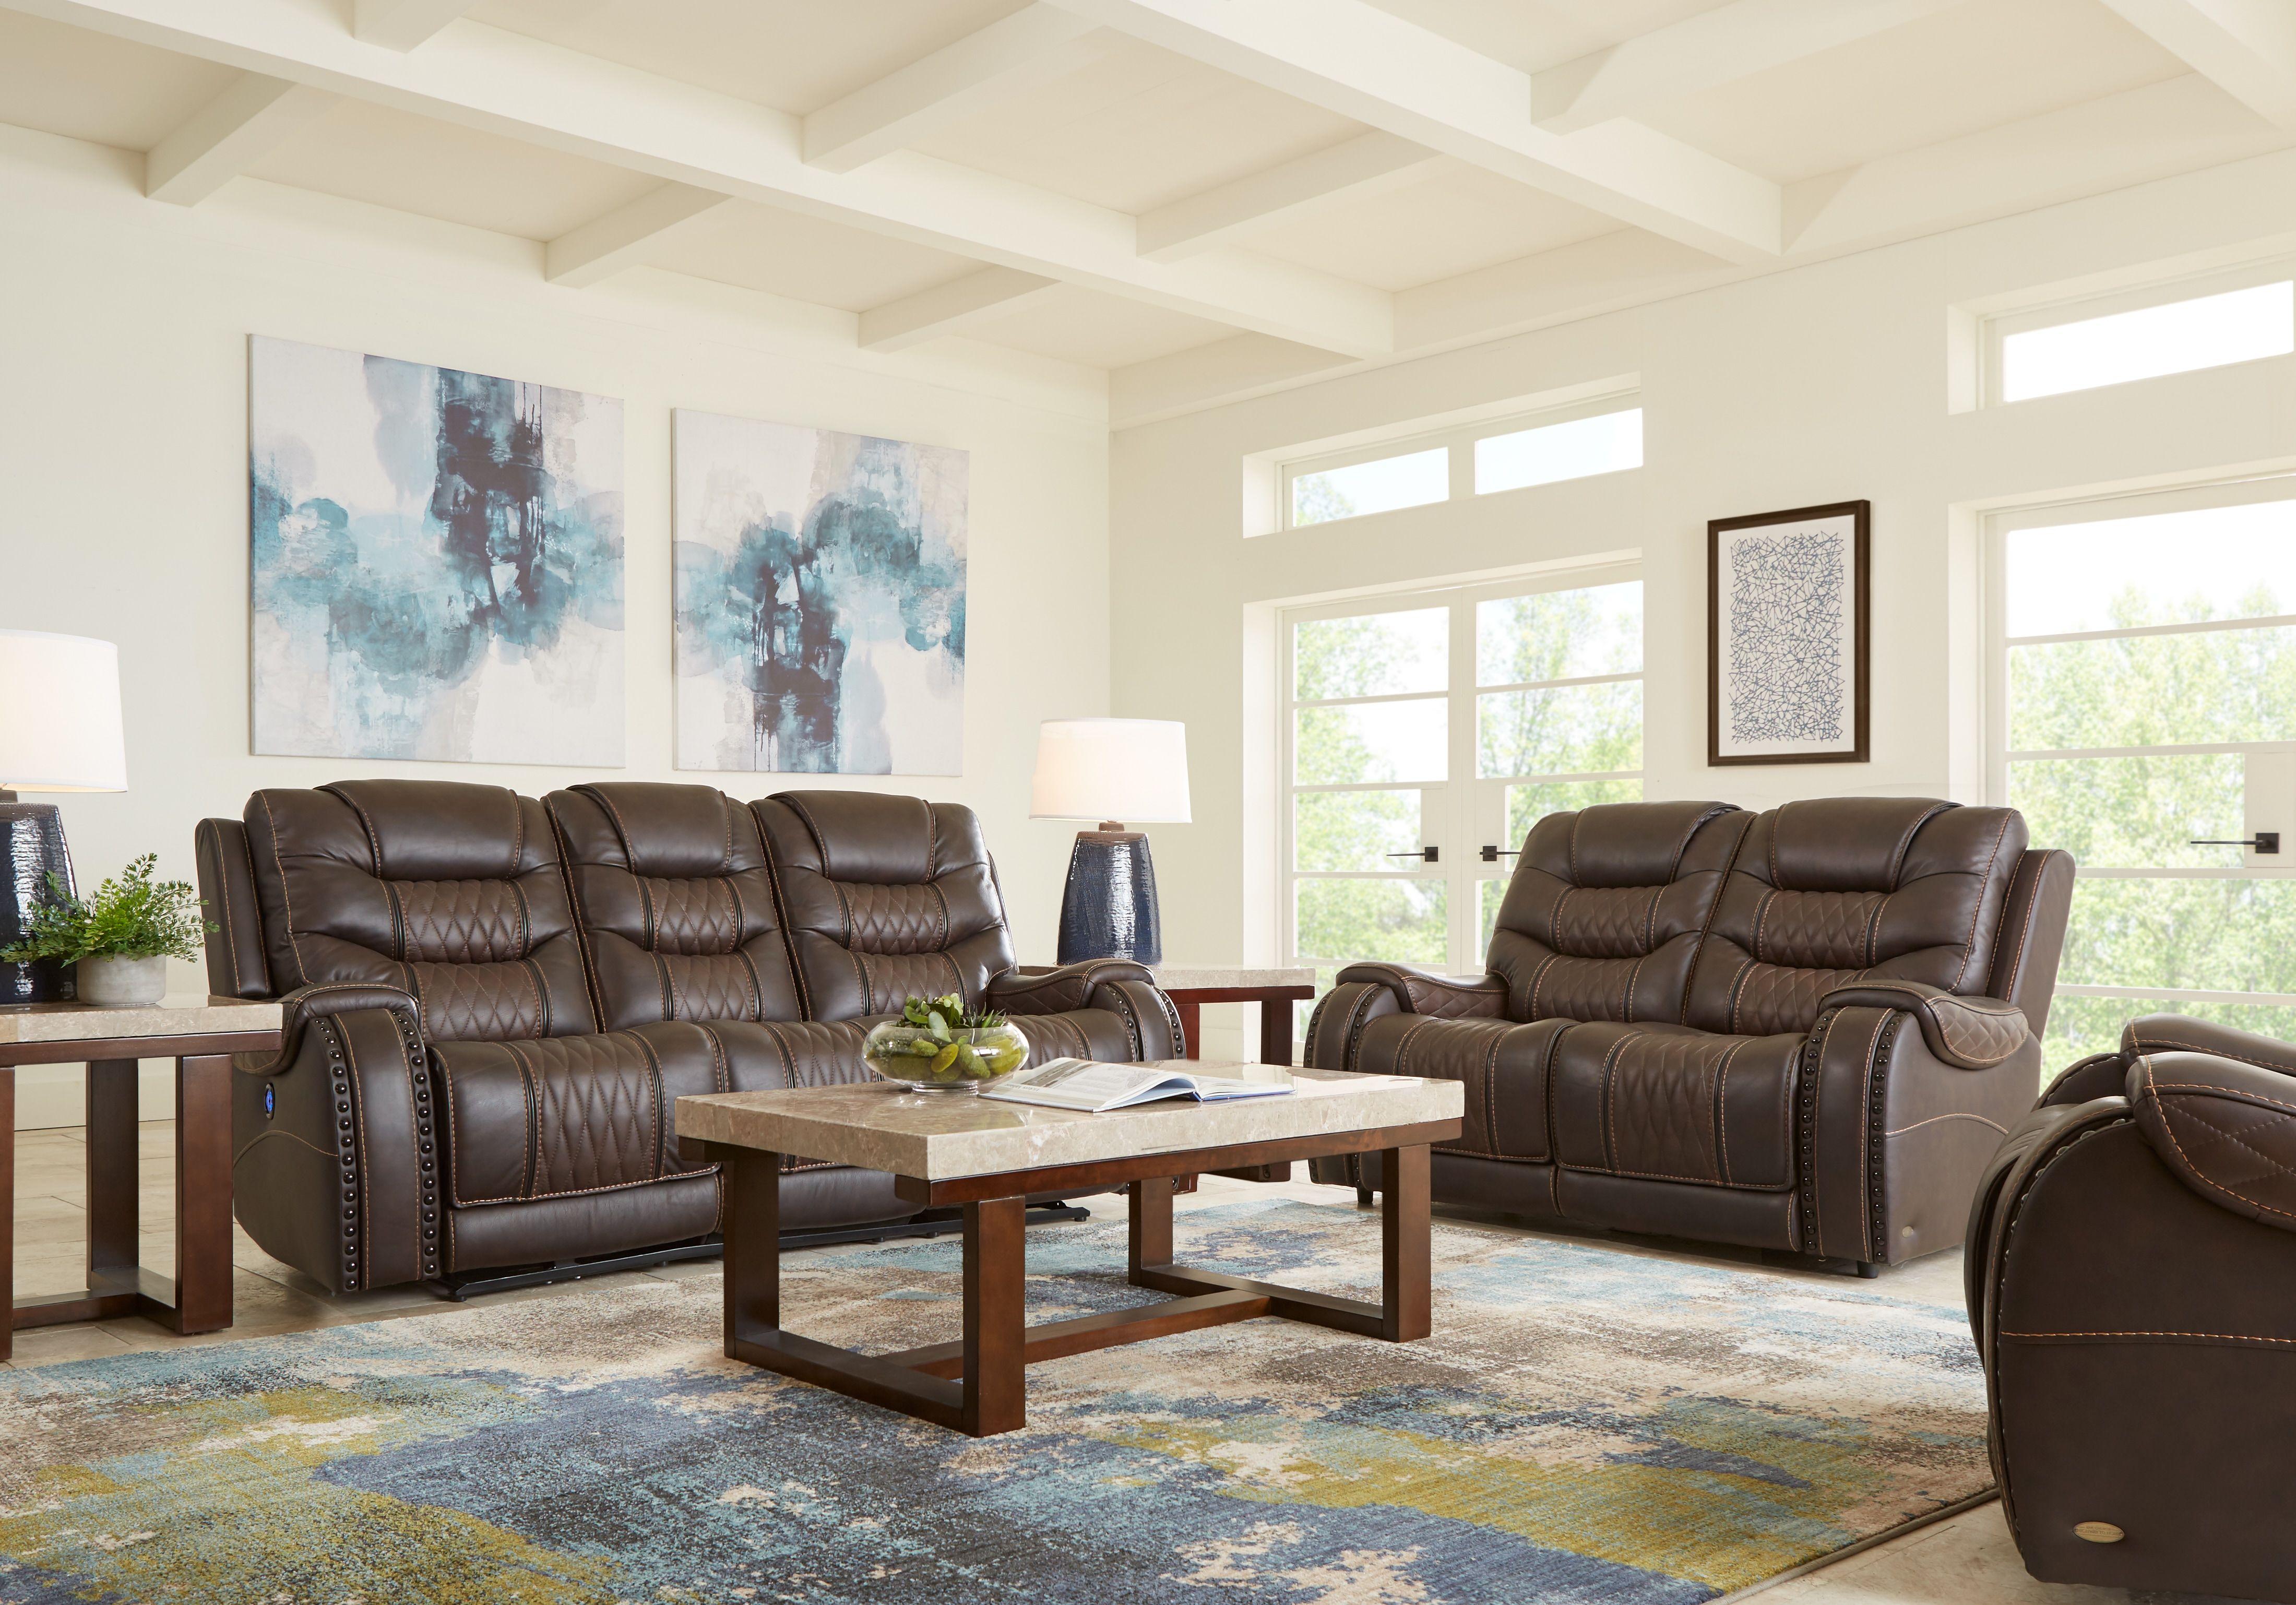 Eric Church Highway To Home Headliner Brown Leather 3 Pc Living Room Living Room Leather Brown Living Room Living Room Sets #rooms #to #go #leather #living #room #set